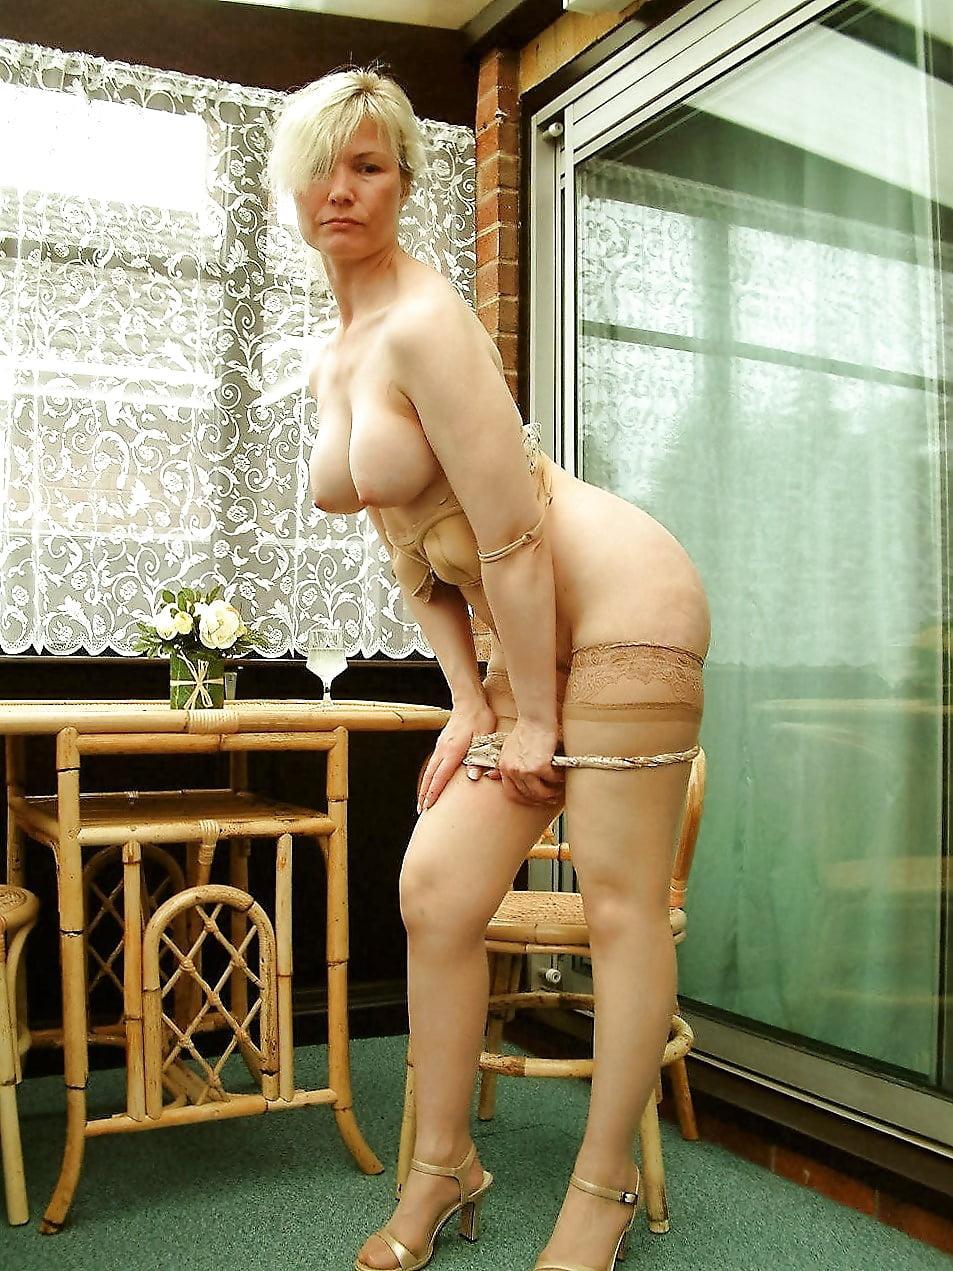 Белобрысая зрелая дама раздевается фото